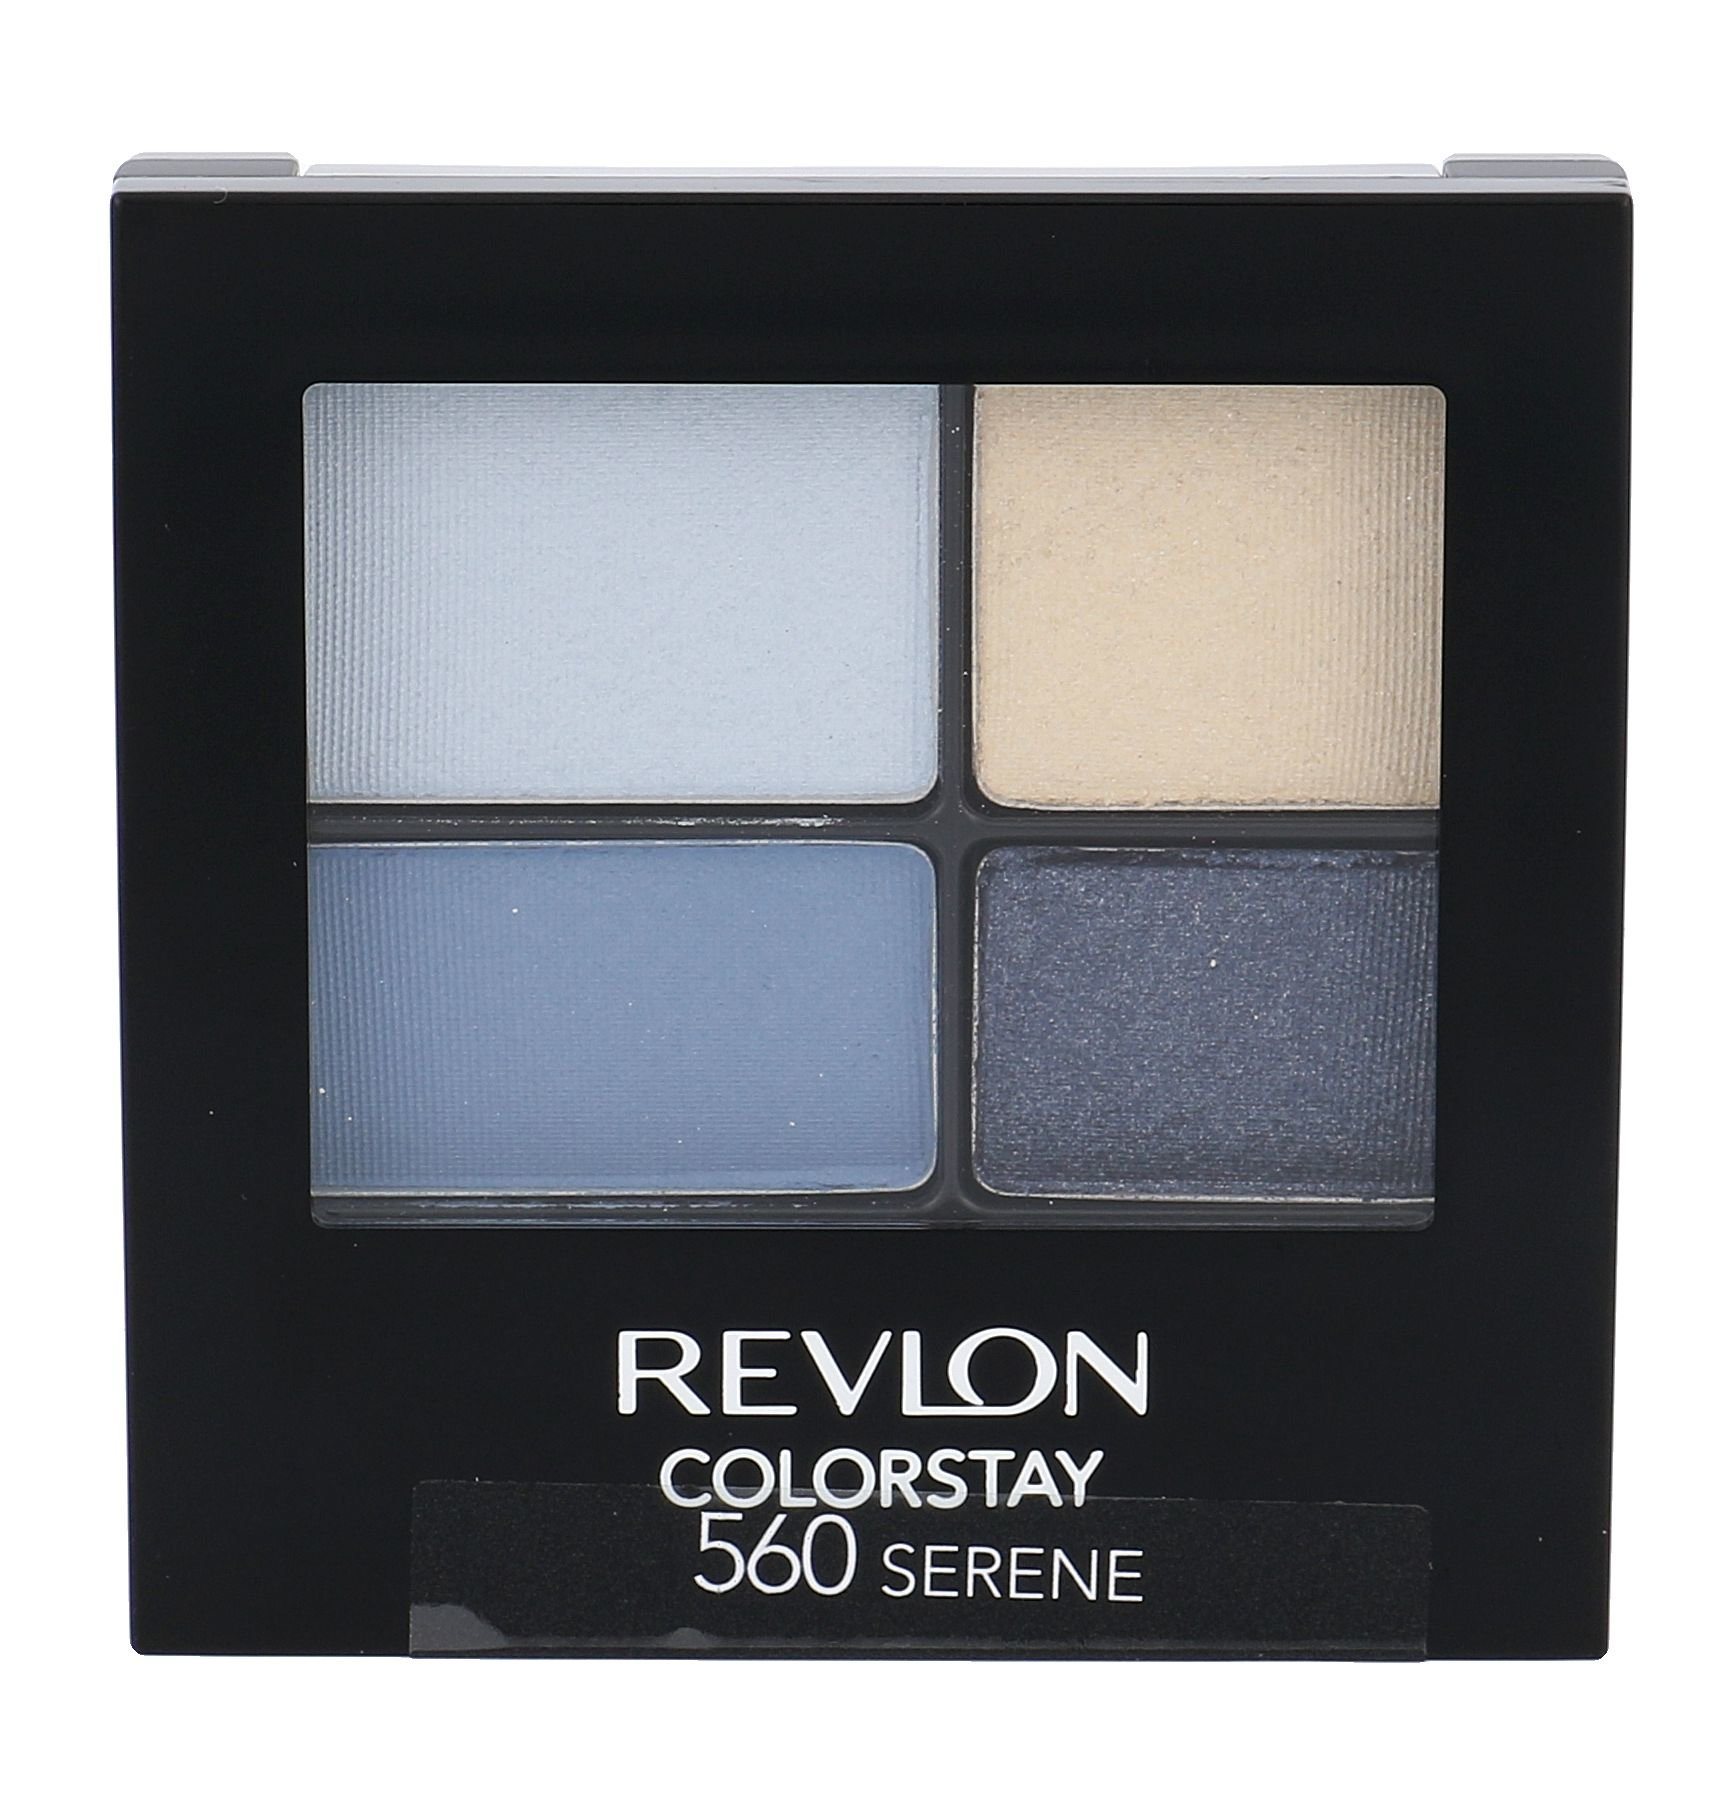 Revlon Colorstay Cosmetic 4,8ml 560 Serene